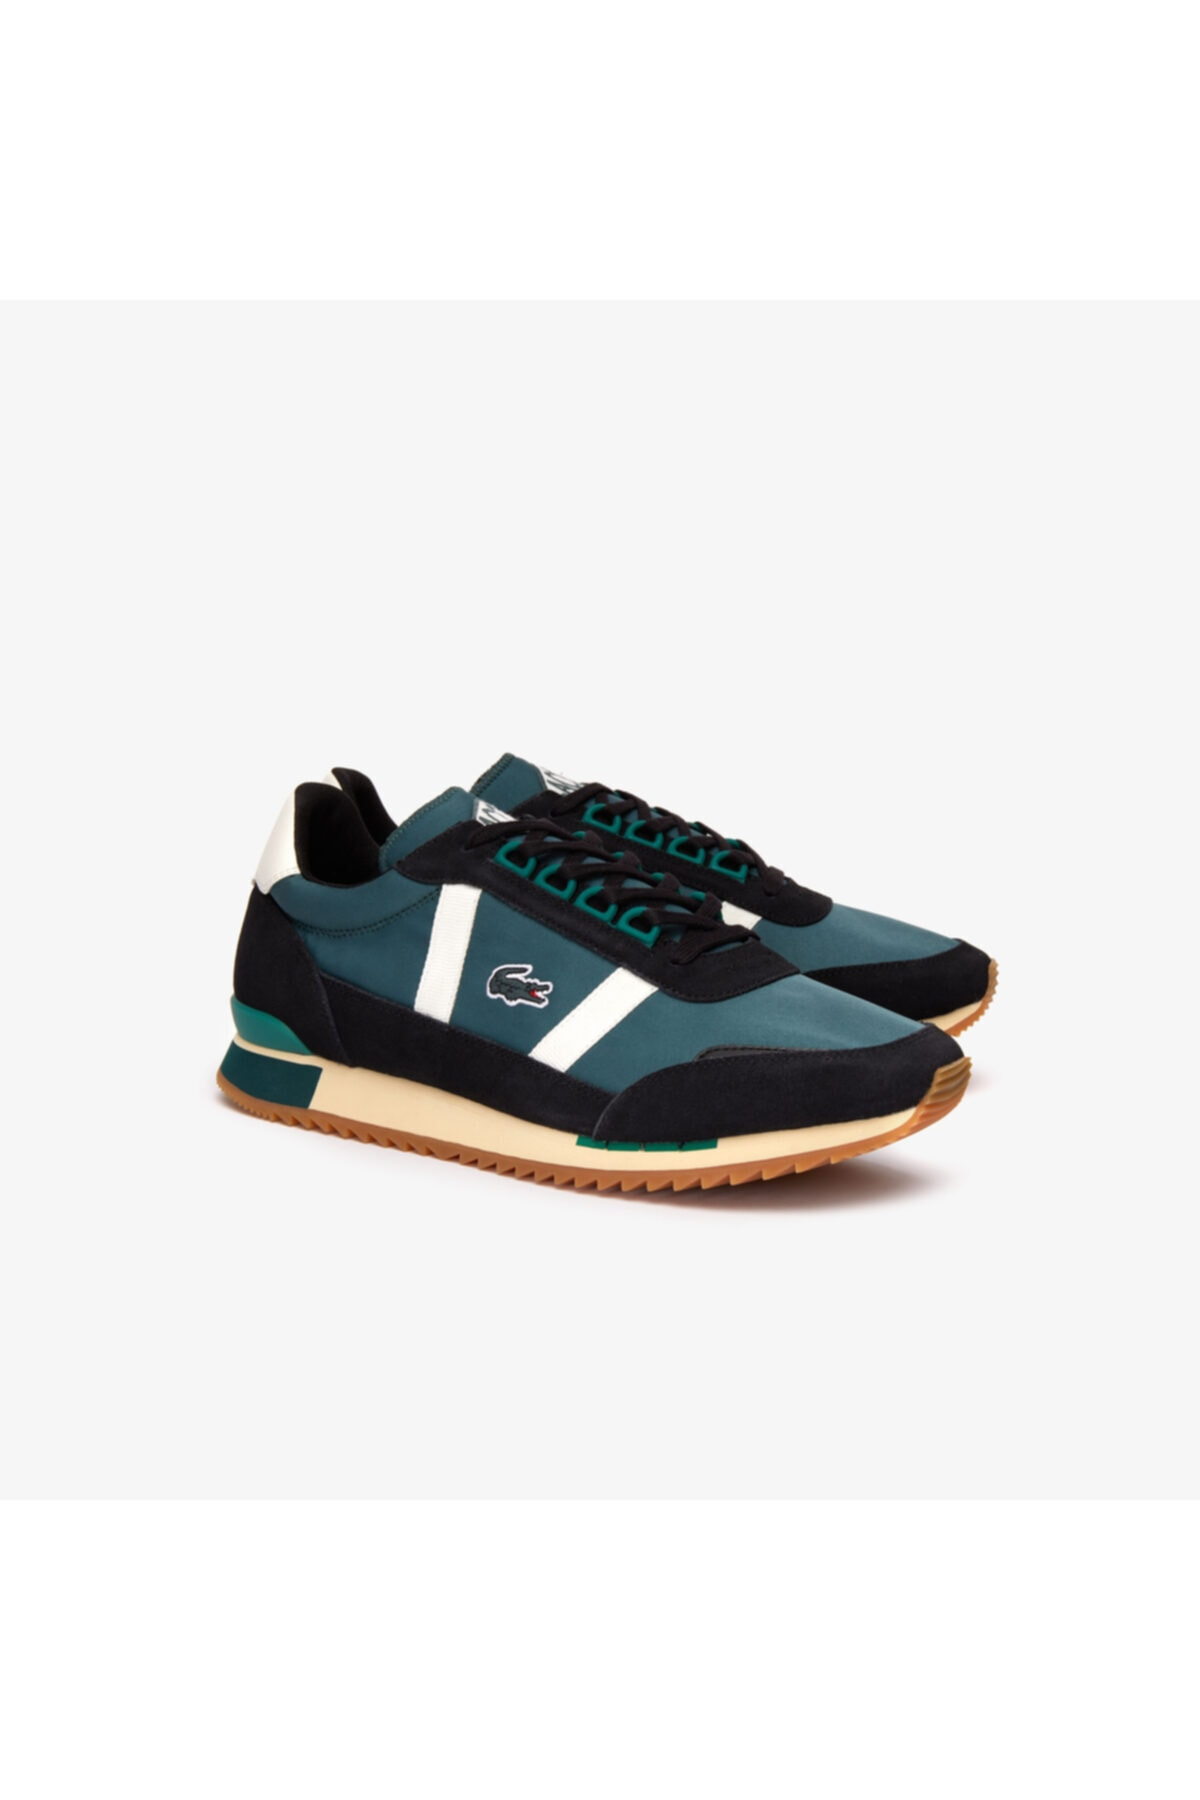 Lacoste Partner Retro 319 1 Sma Erkek Koyu Yeşil - Bej Sneaker 2